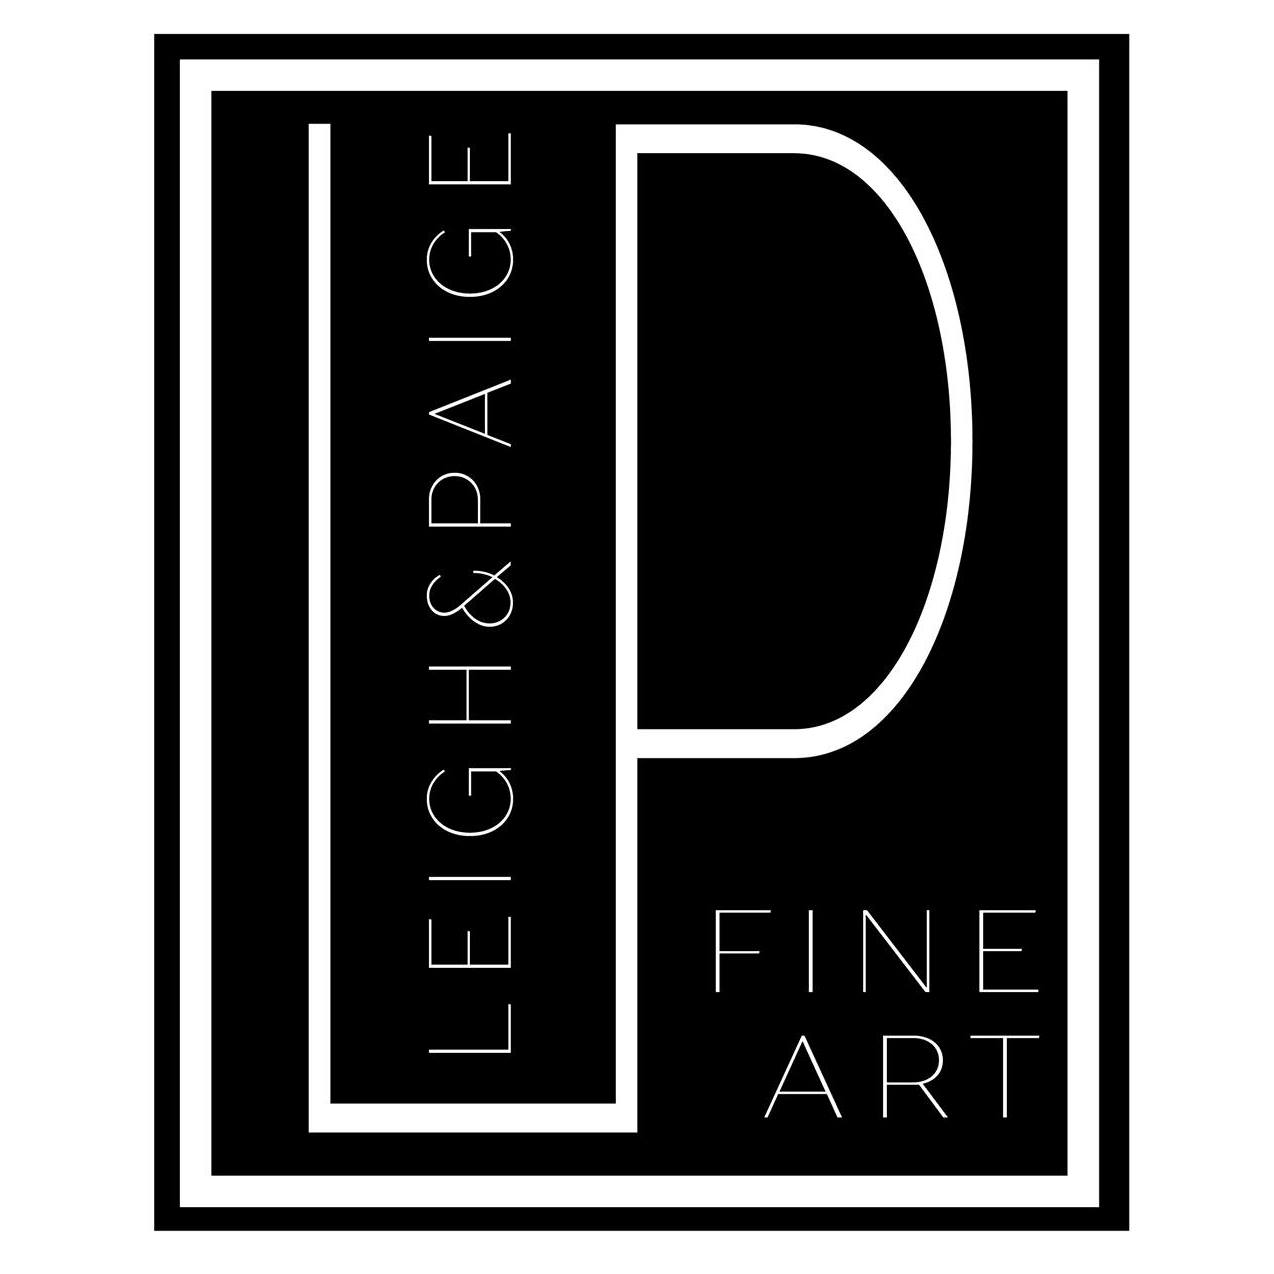 Leigh & Paige Fine Art